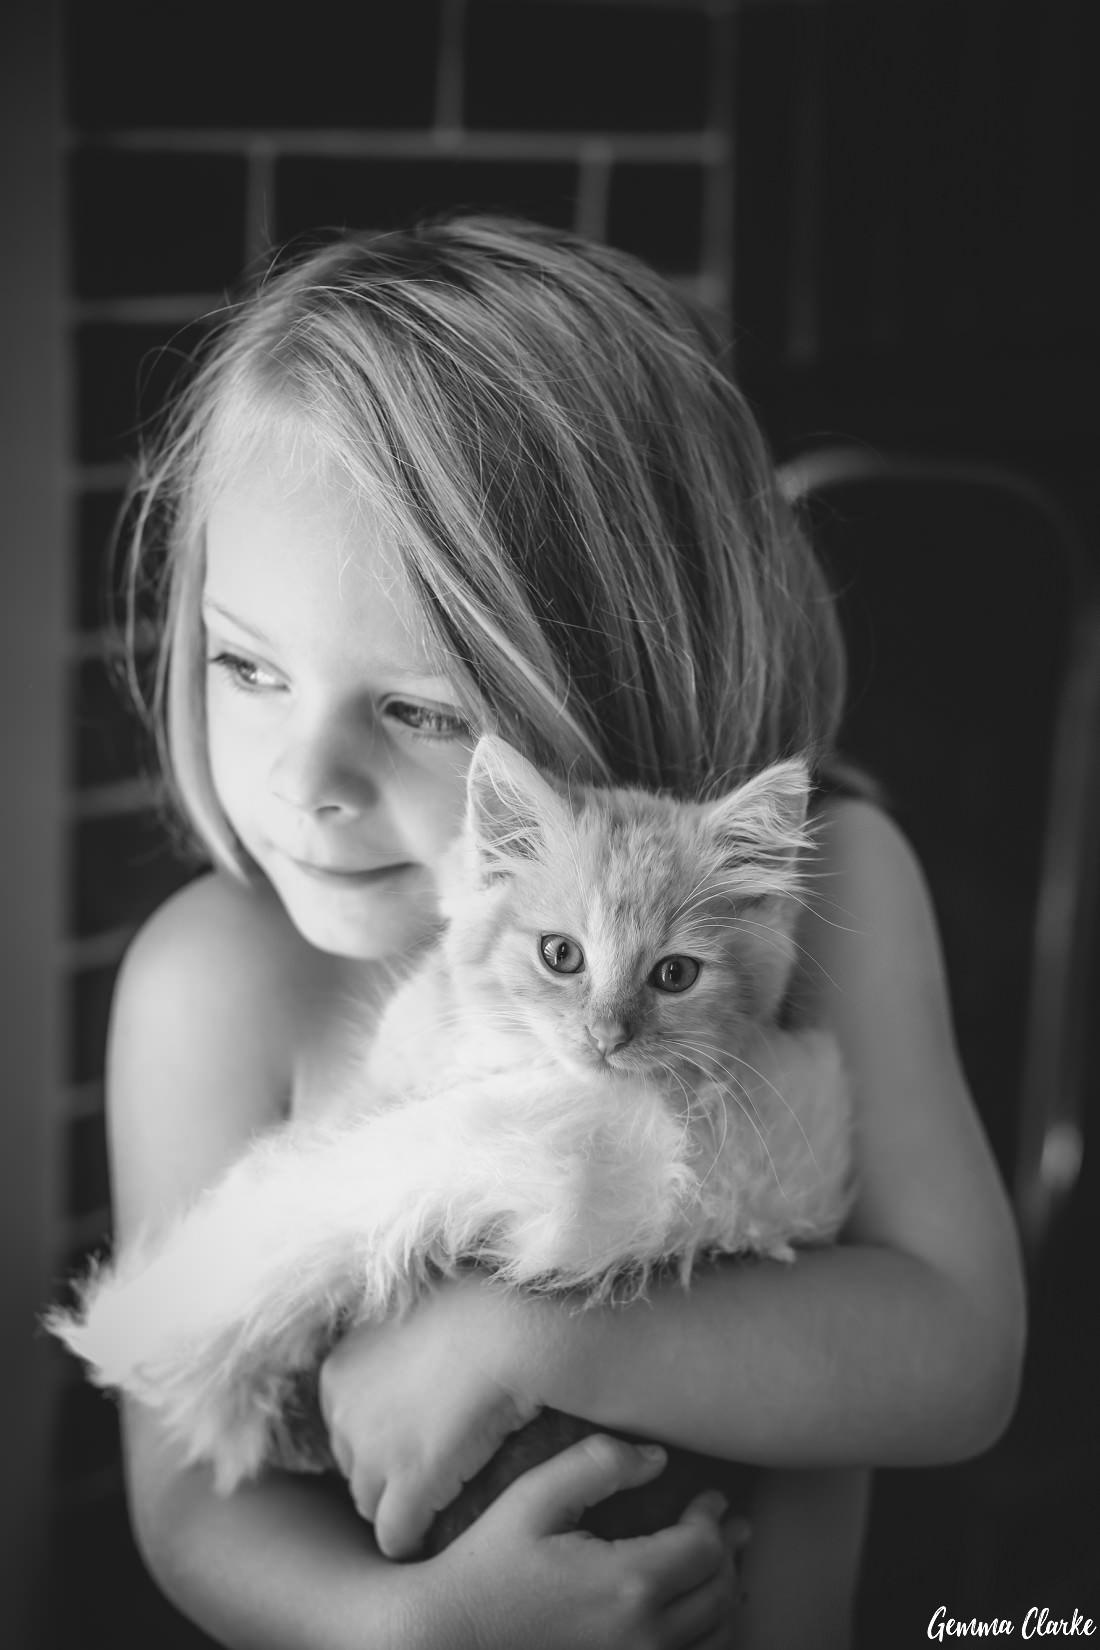 A small girl holding a very cute kitten - 2016 highlights